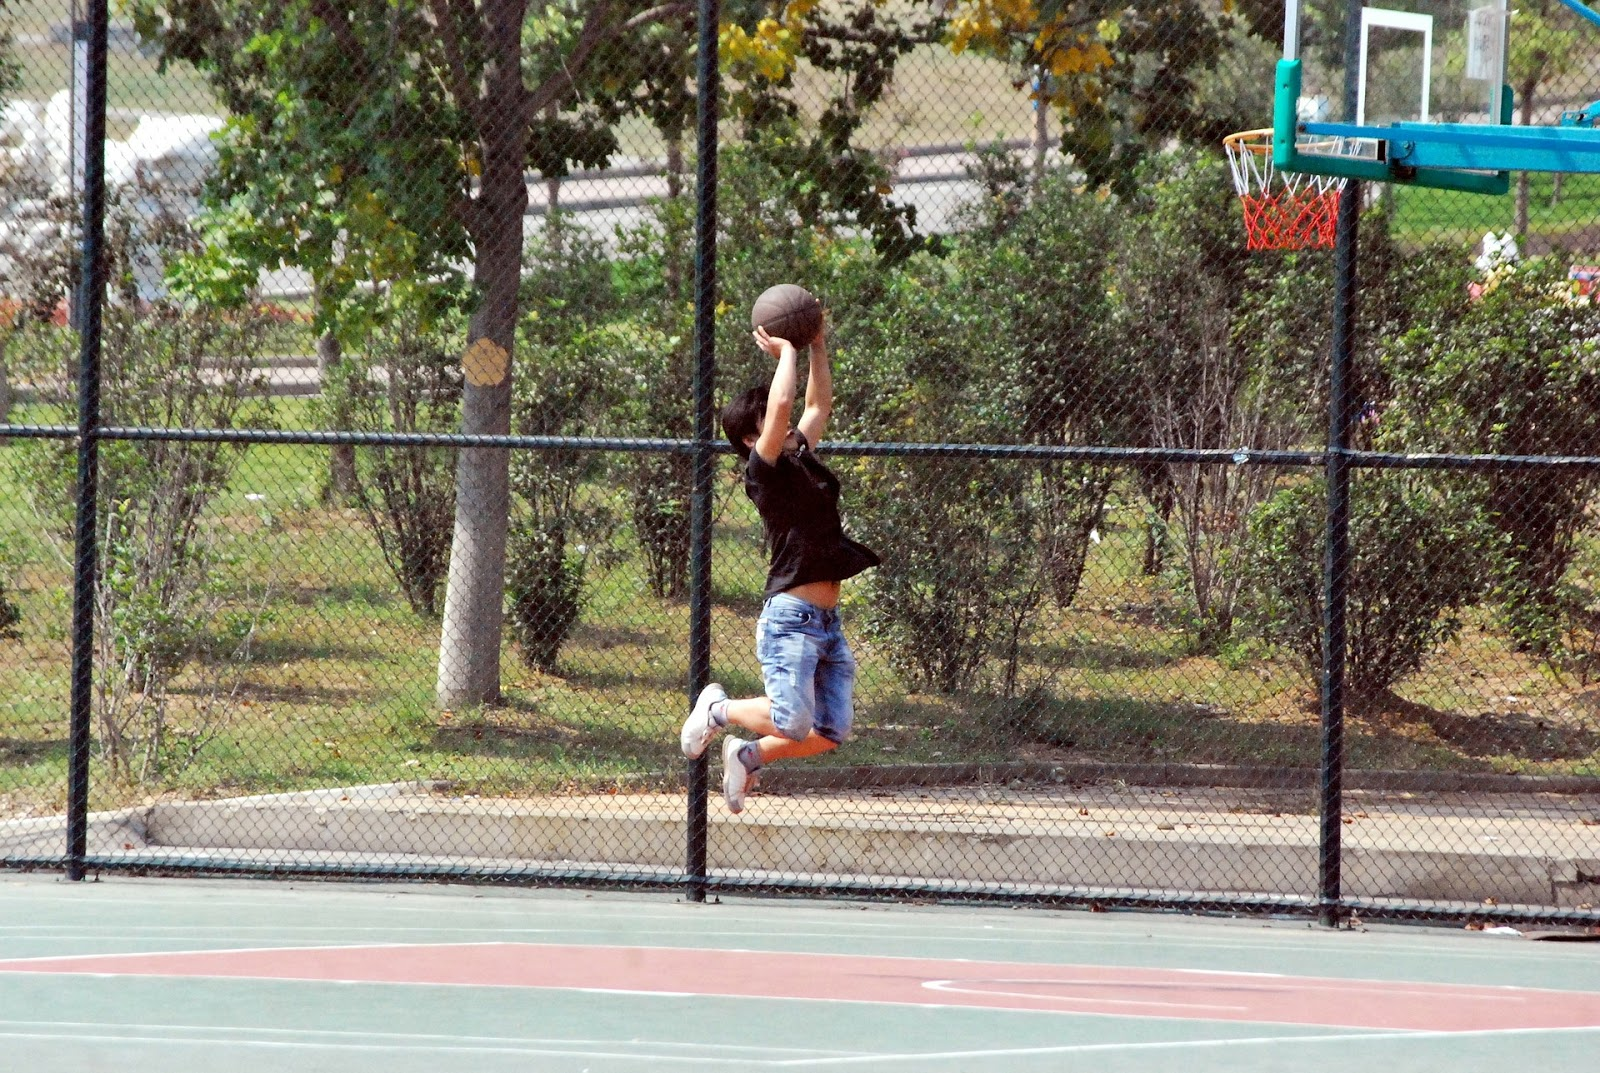 Aumenta tu salto vertical